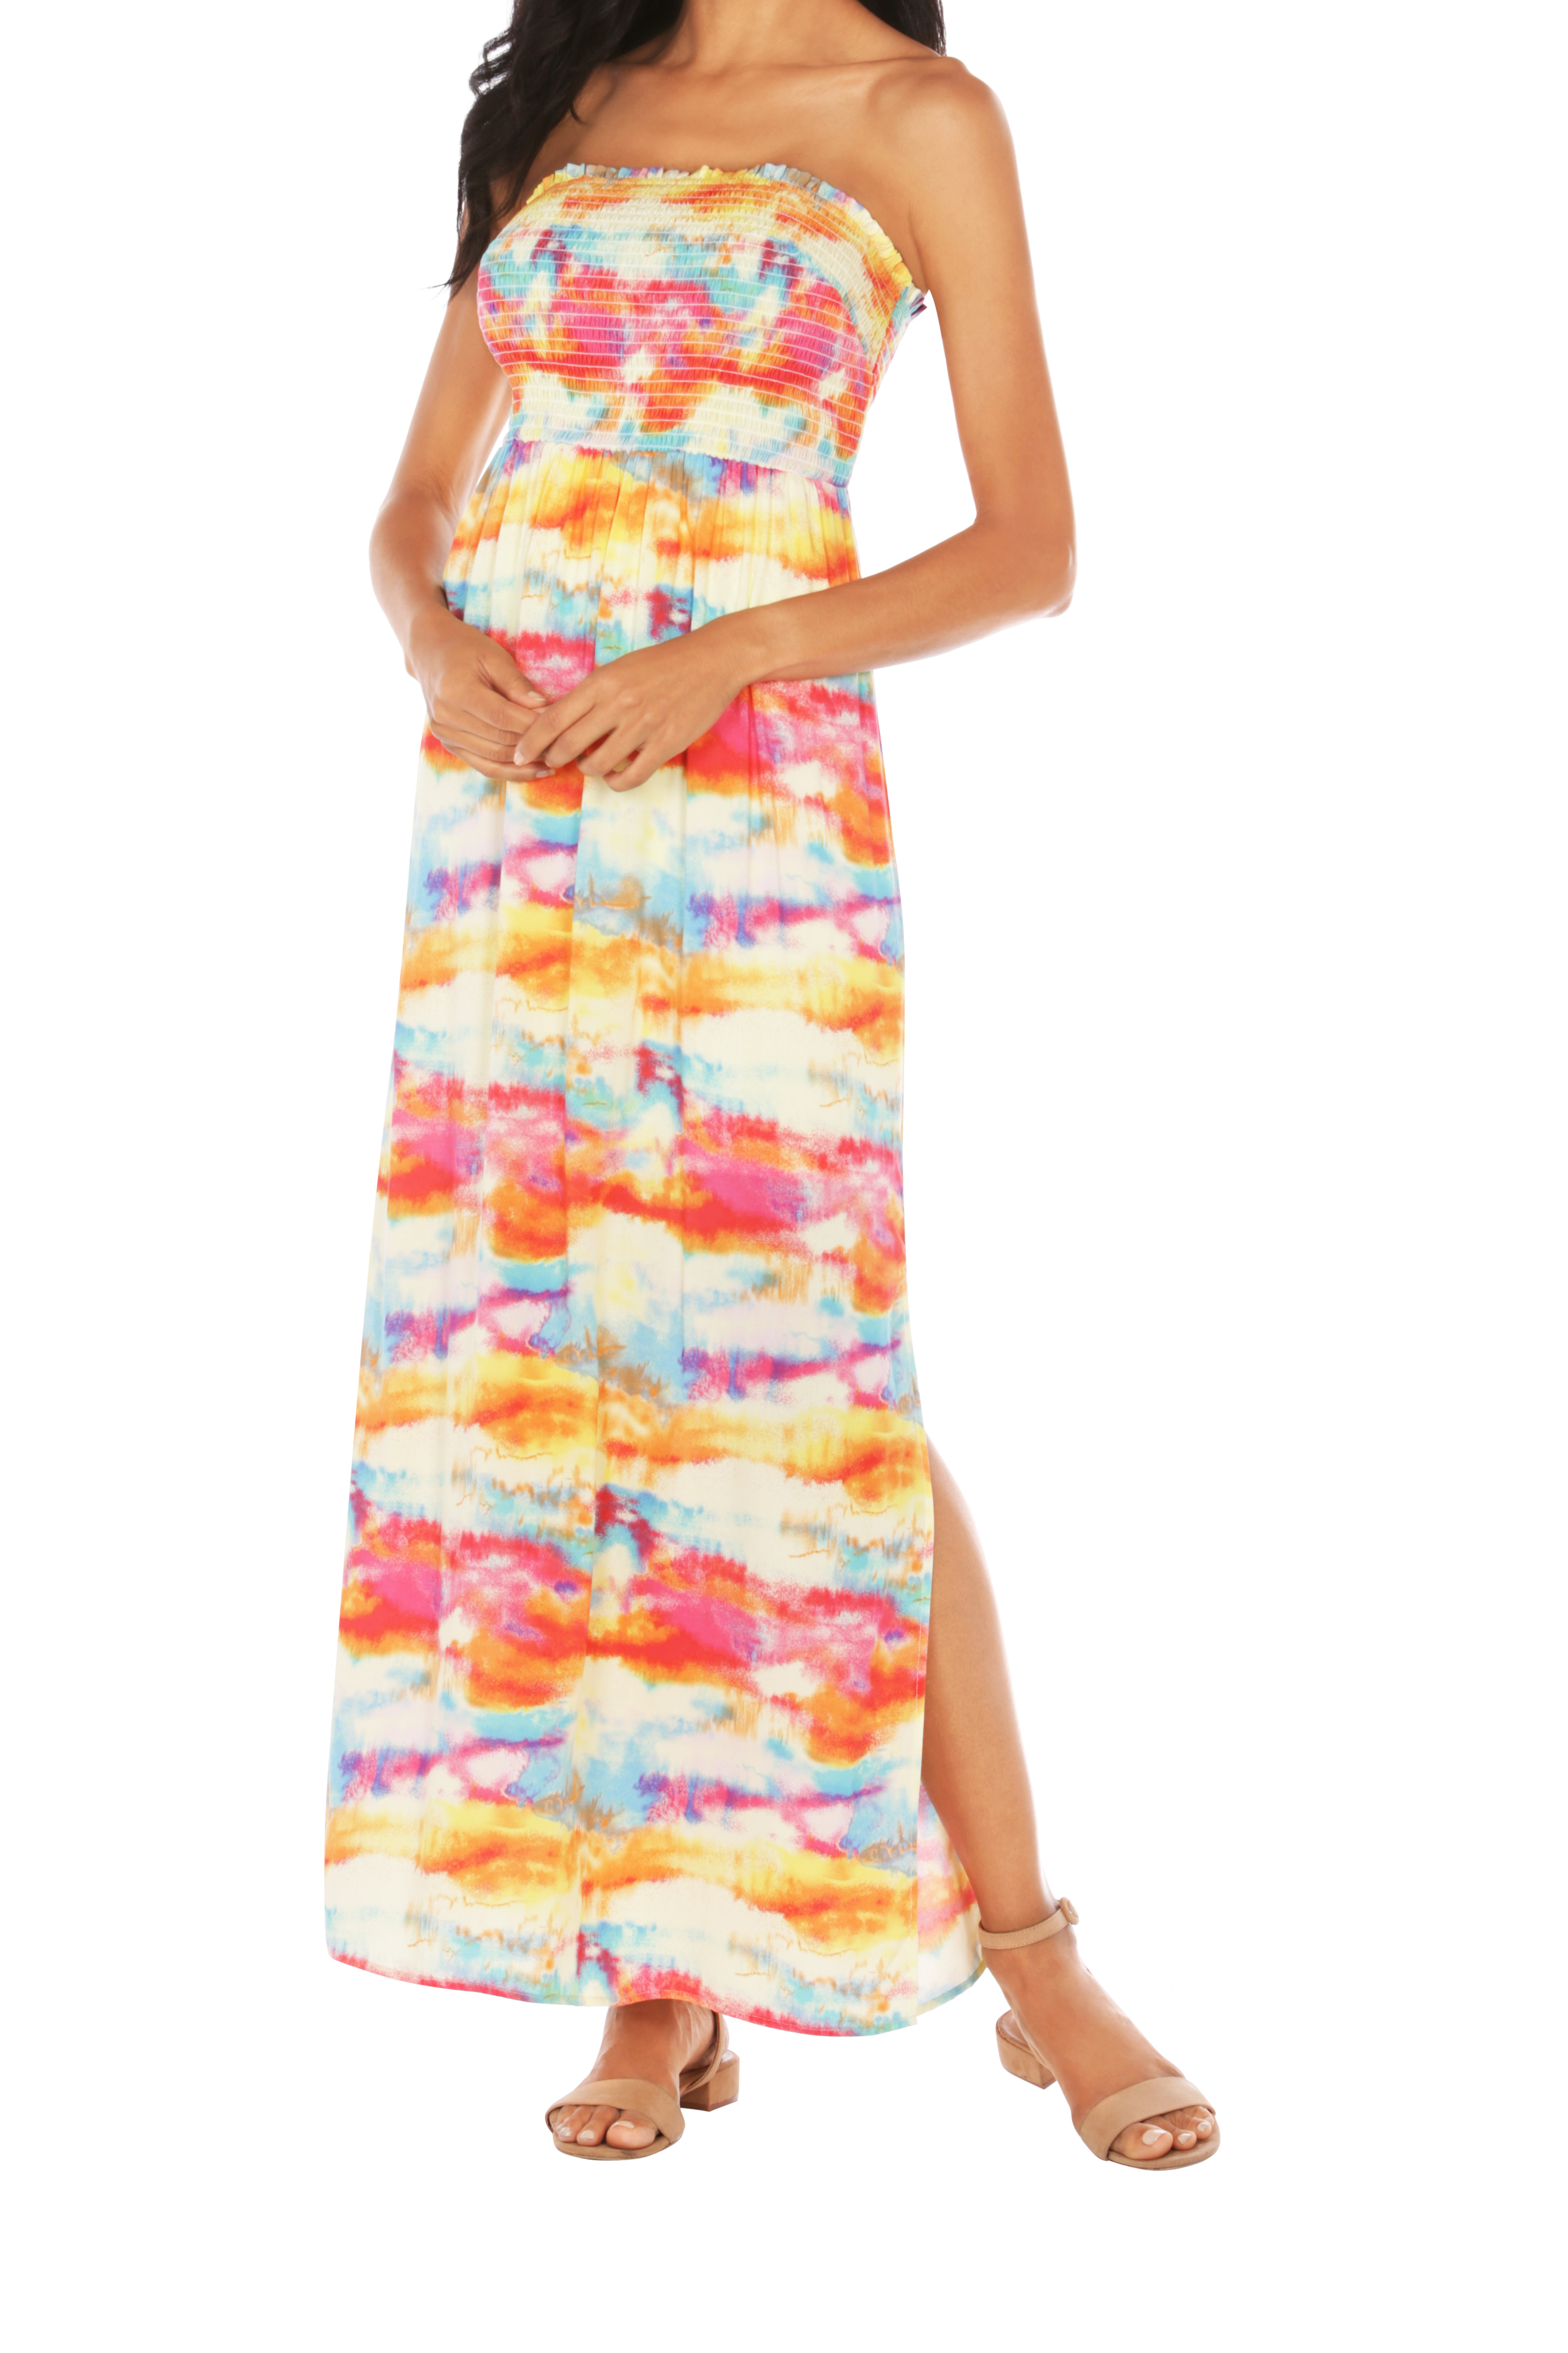 Caribbean Joe® Smocked Maxi Dress -Saffron - Front